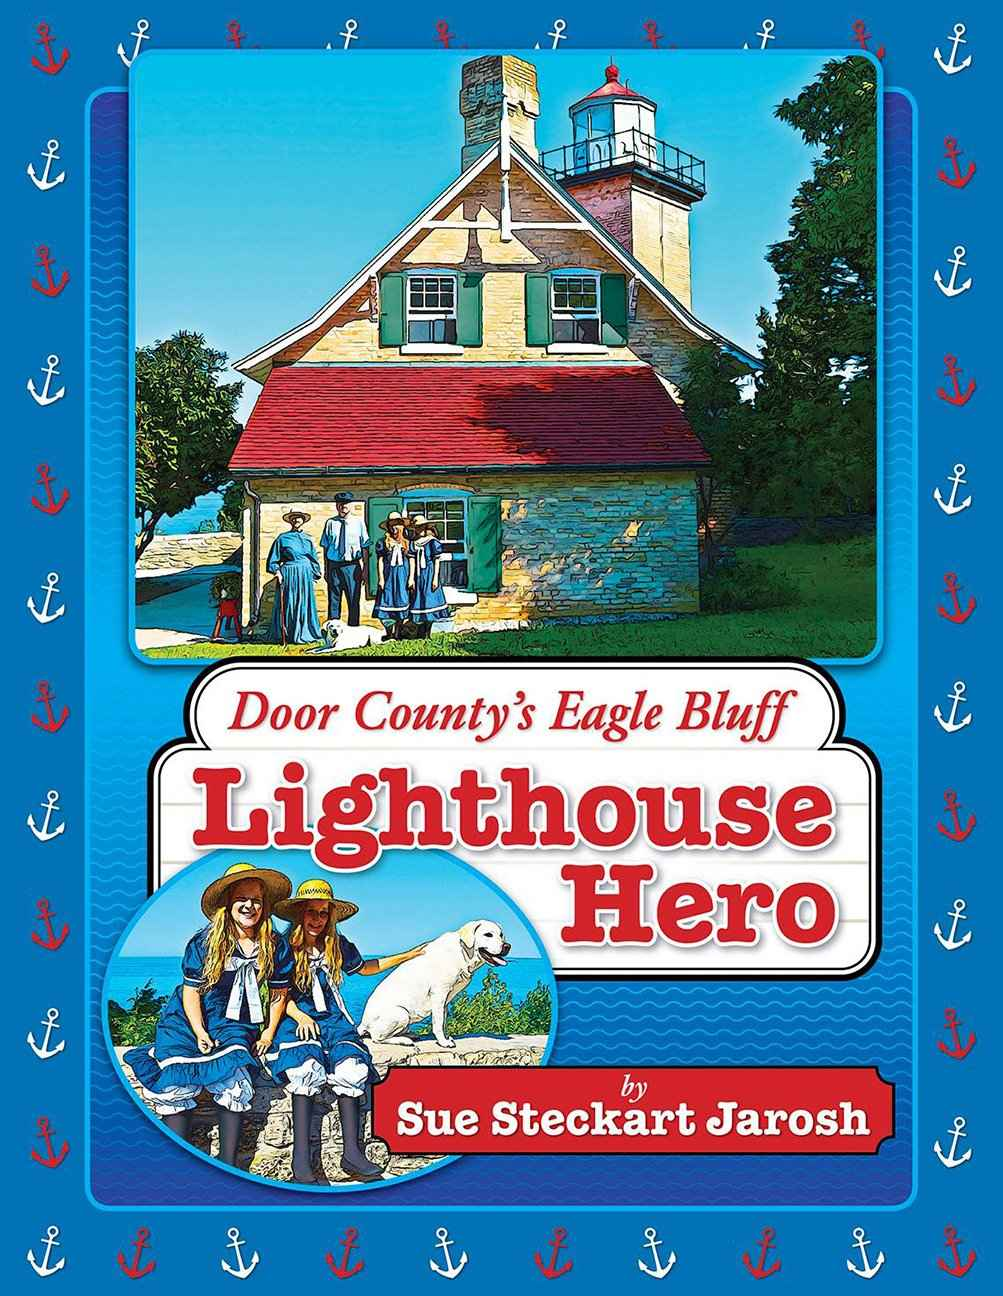 1 Lighthouse Hero